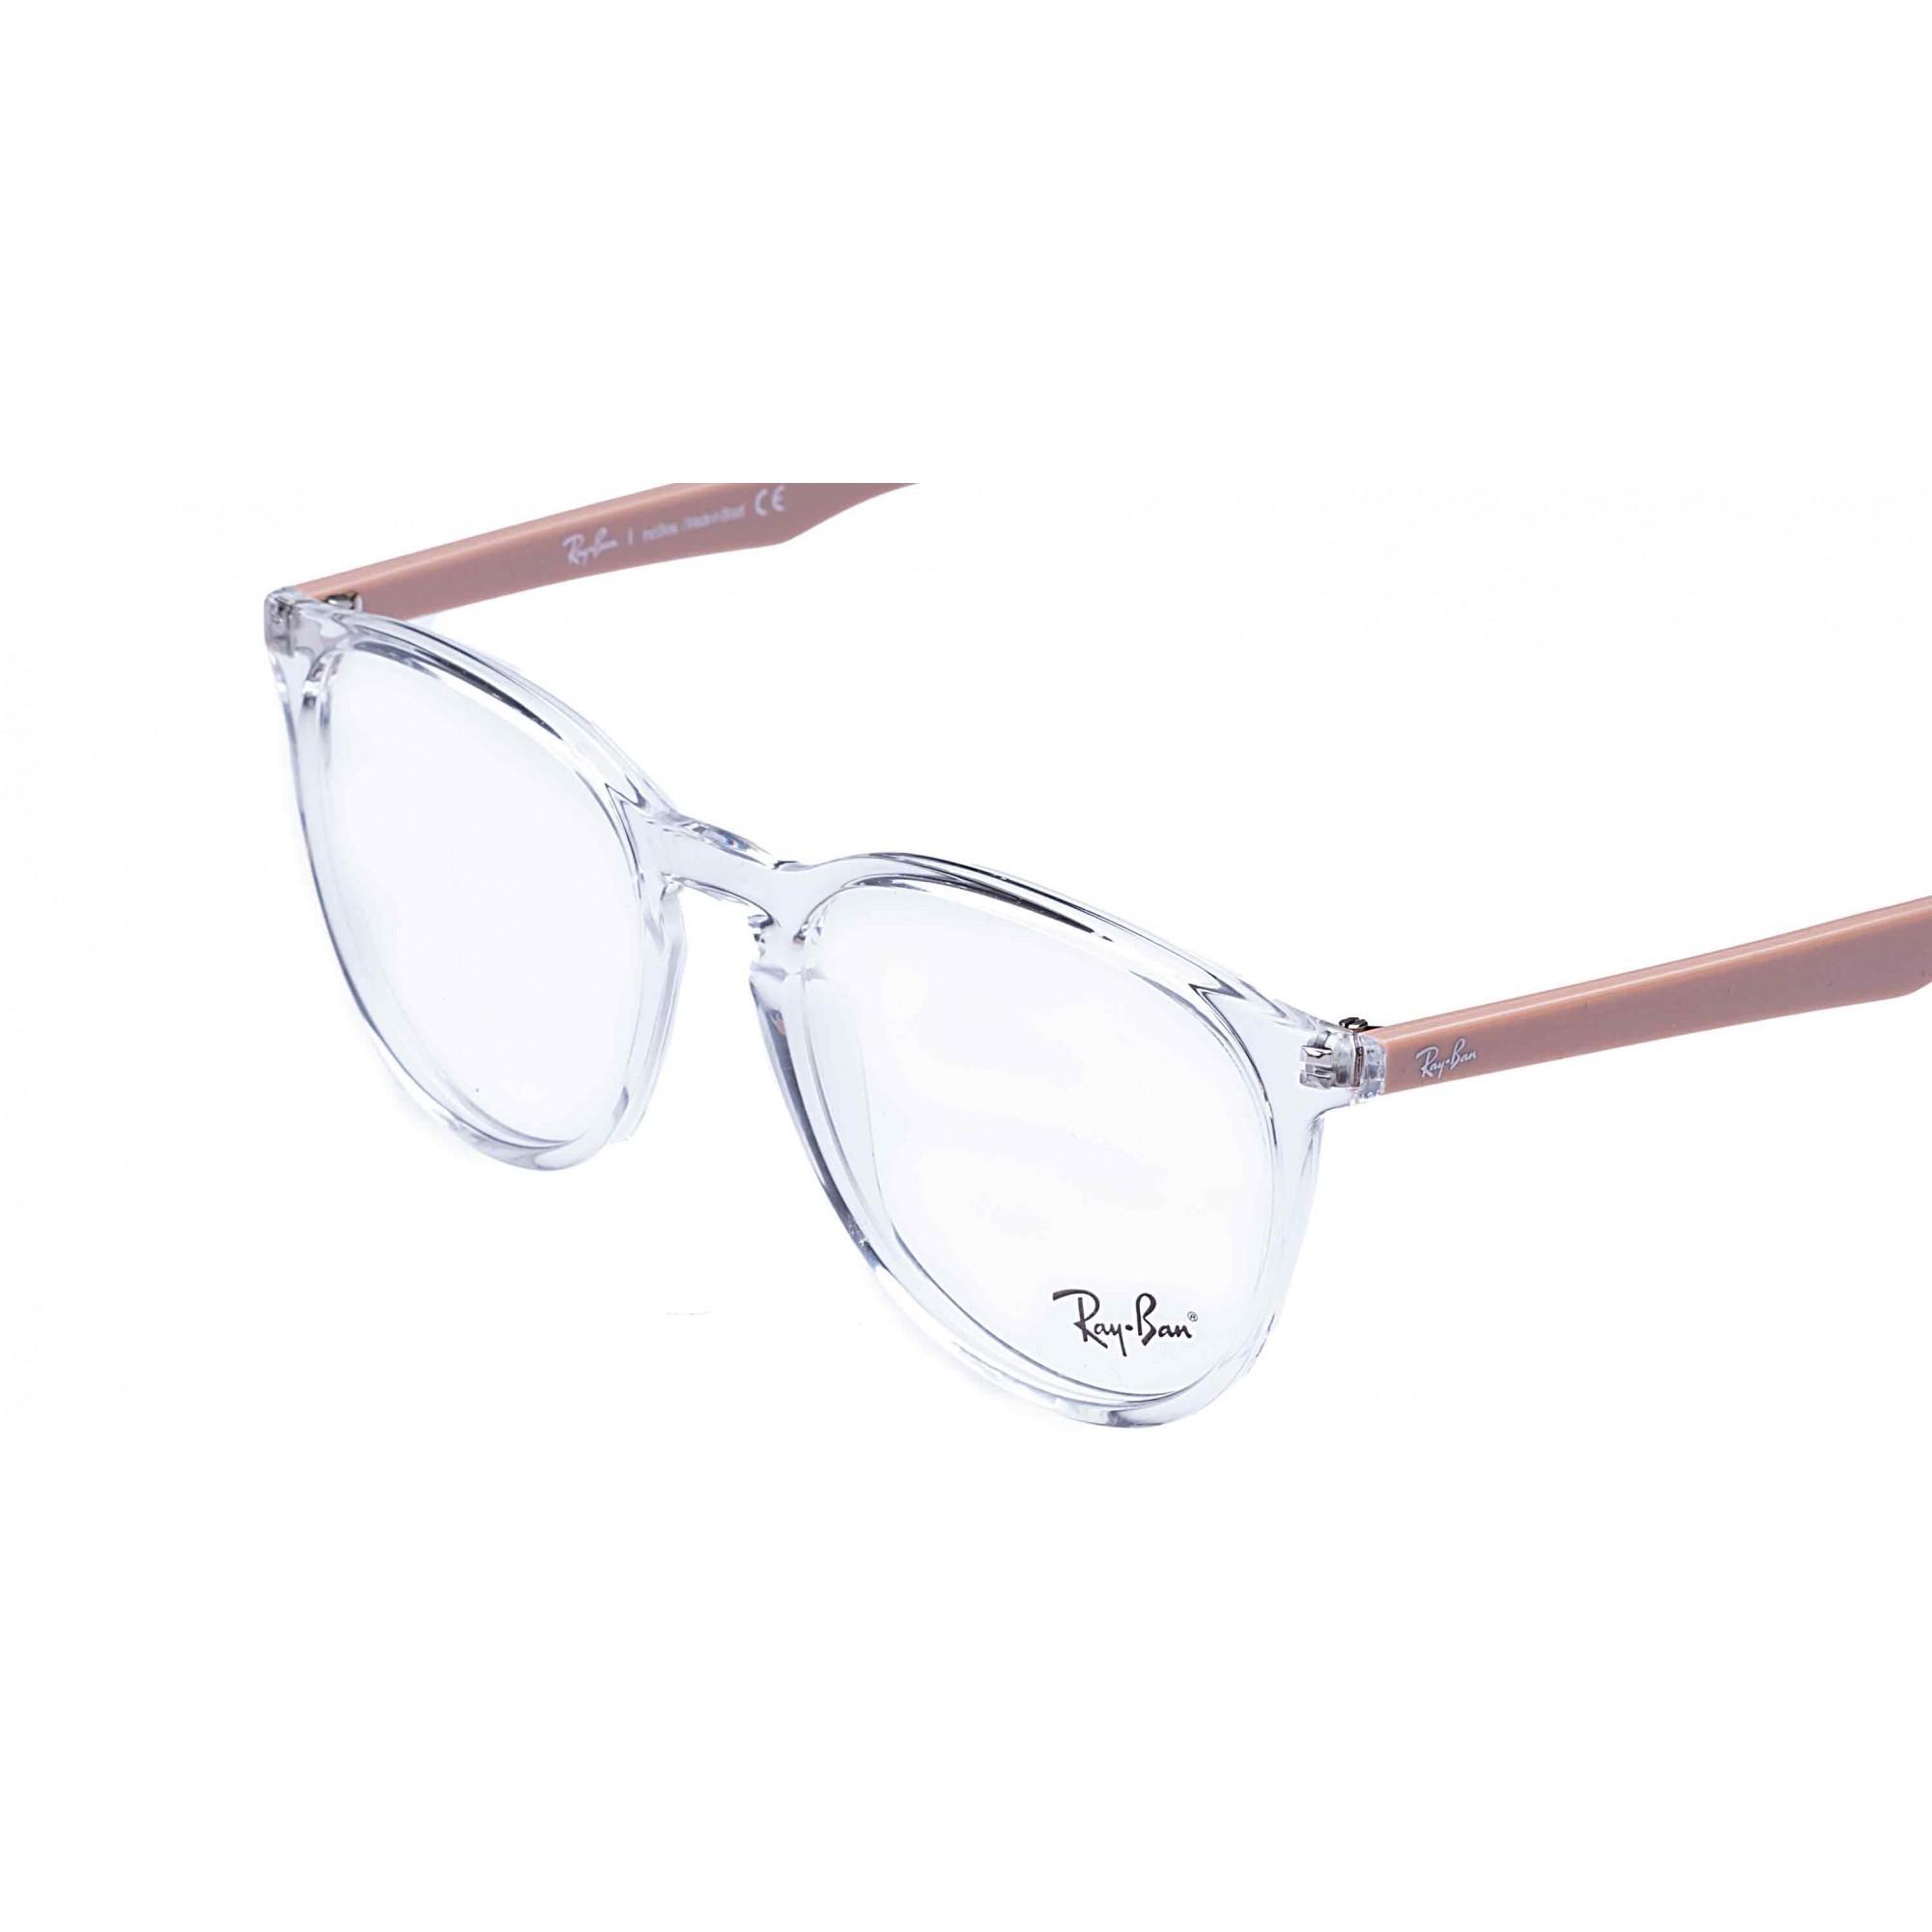 Óculos de Grau Erika Optics Ray-Ban - Original